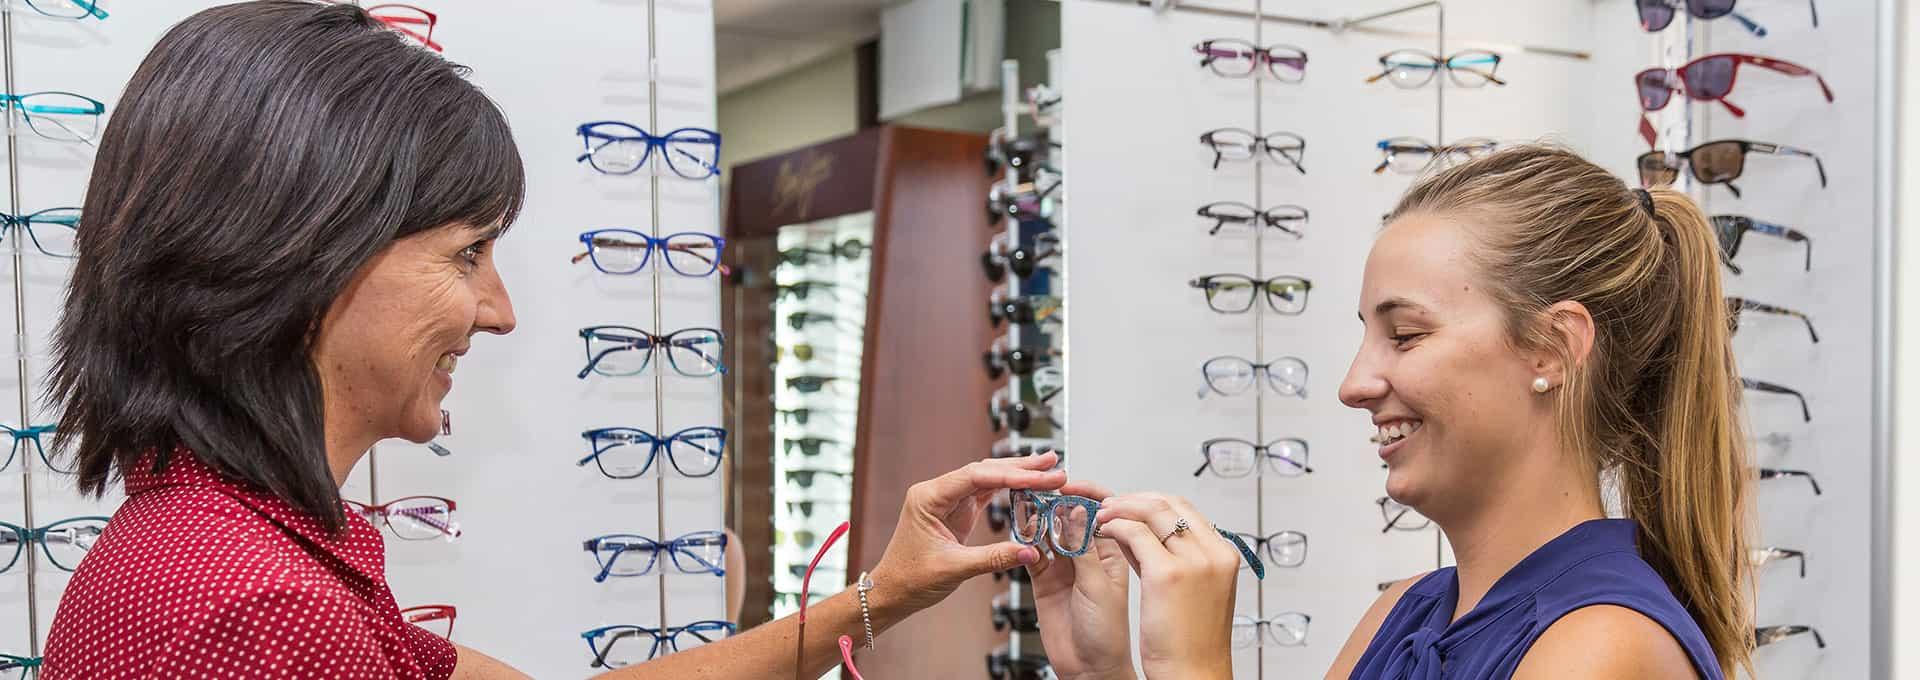 caloundra-vision-optometrists-banner-customer-02-desktop